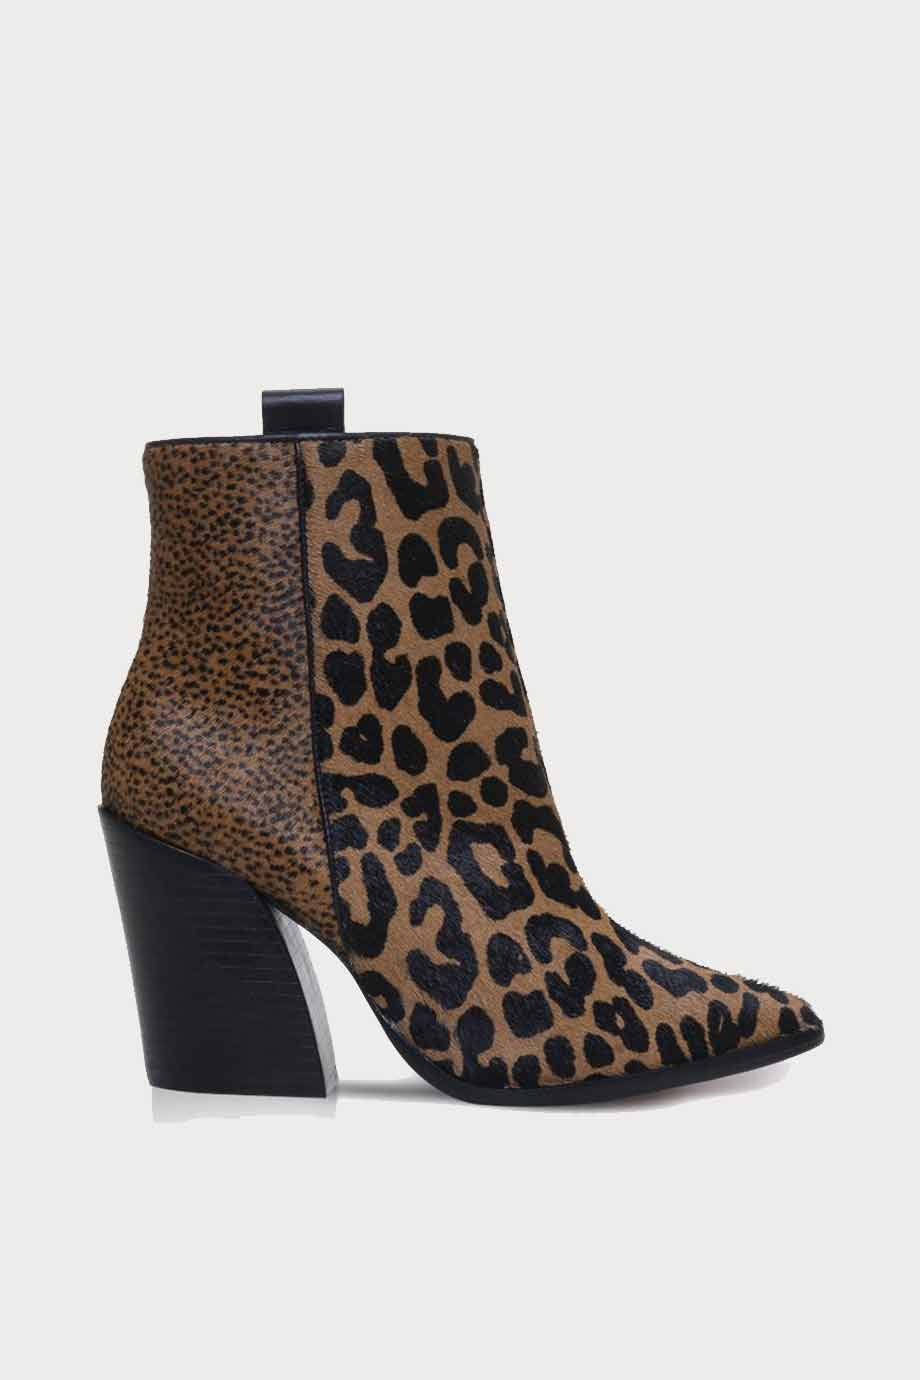 spiridoula metheniti shoes xalkida p 377004 pelo leopard lince mestico camel black carrano